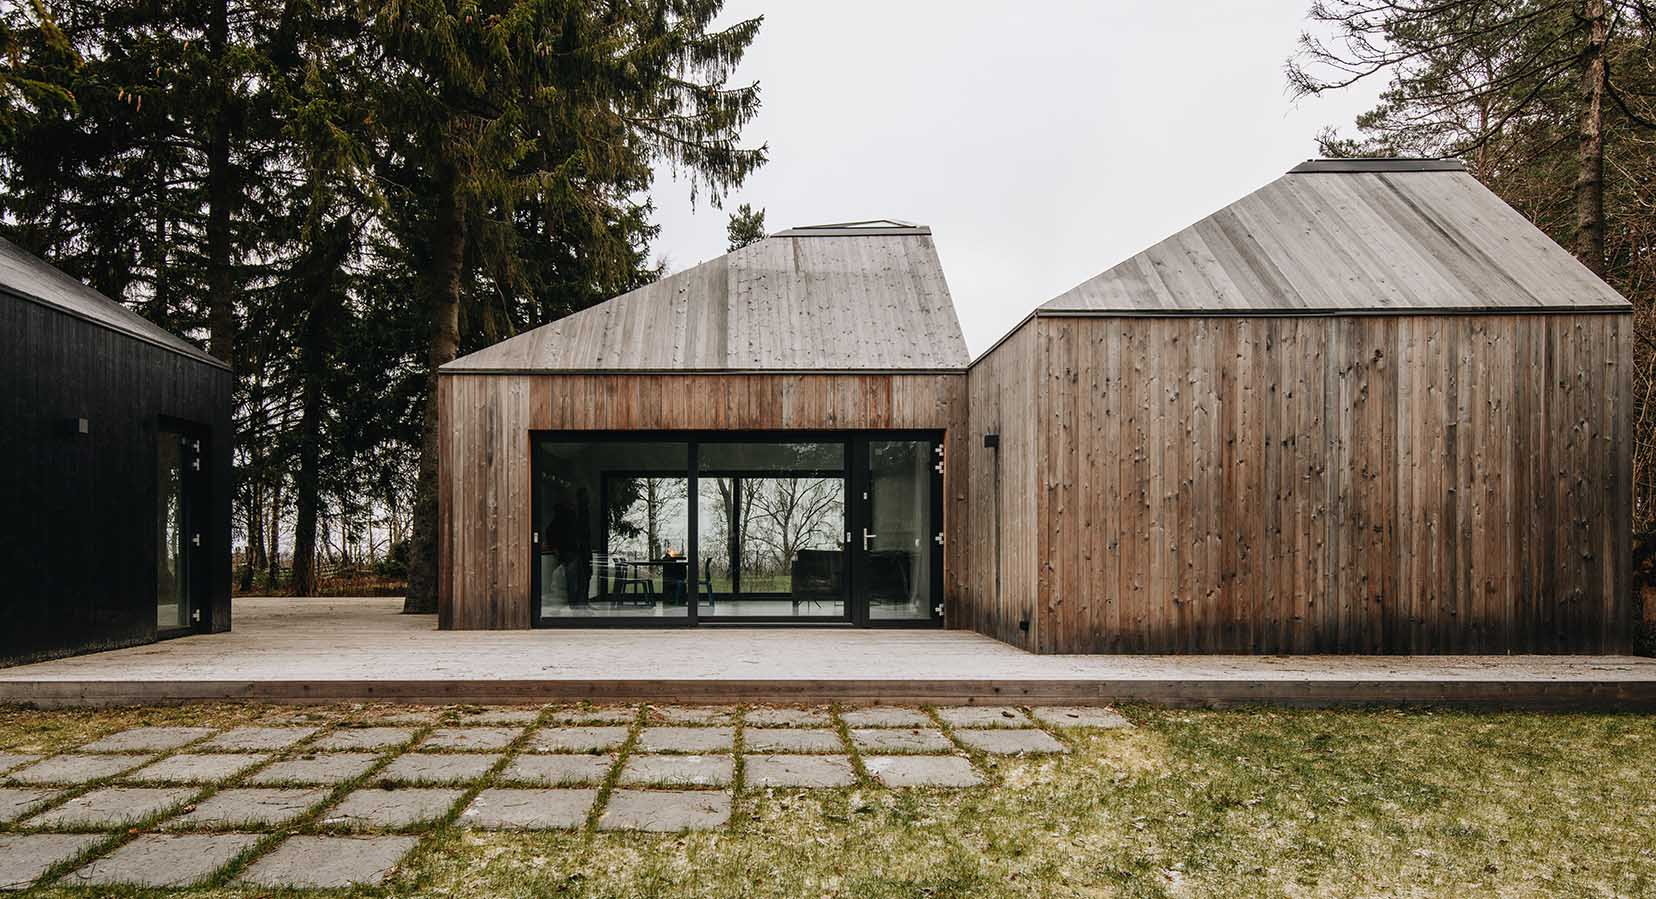 Four Interior Ideas From KUU Arhitektid's Estonian Cottage